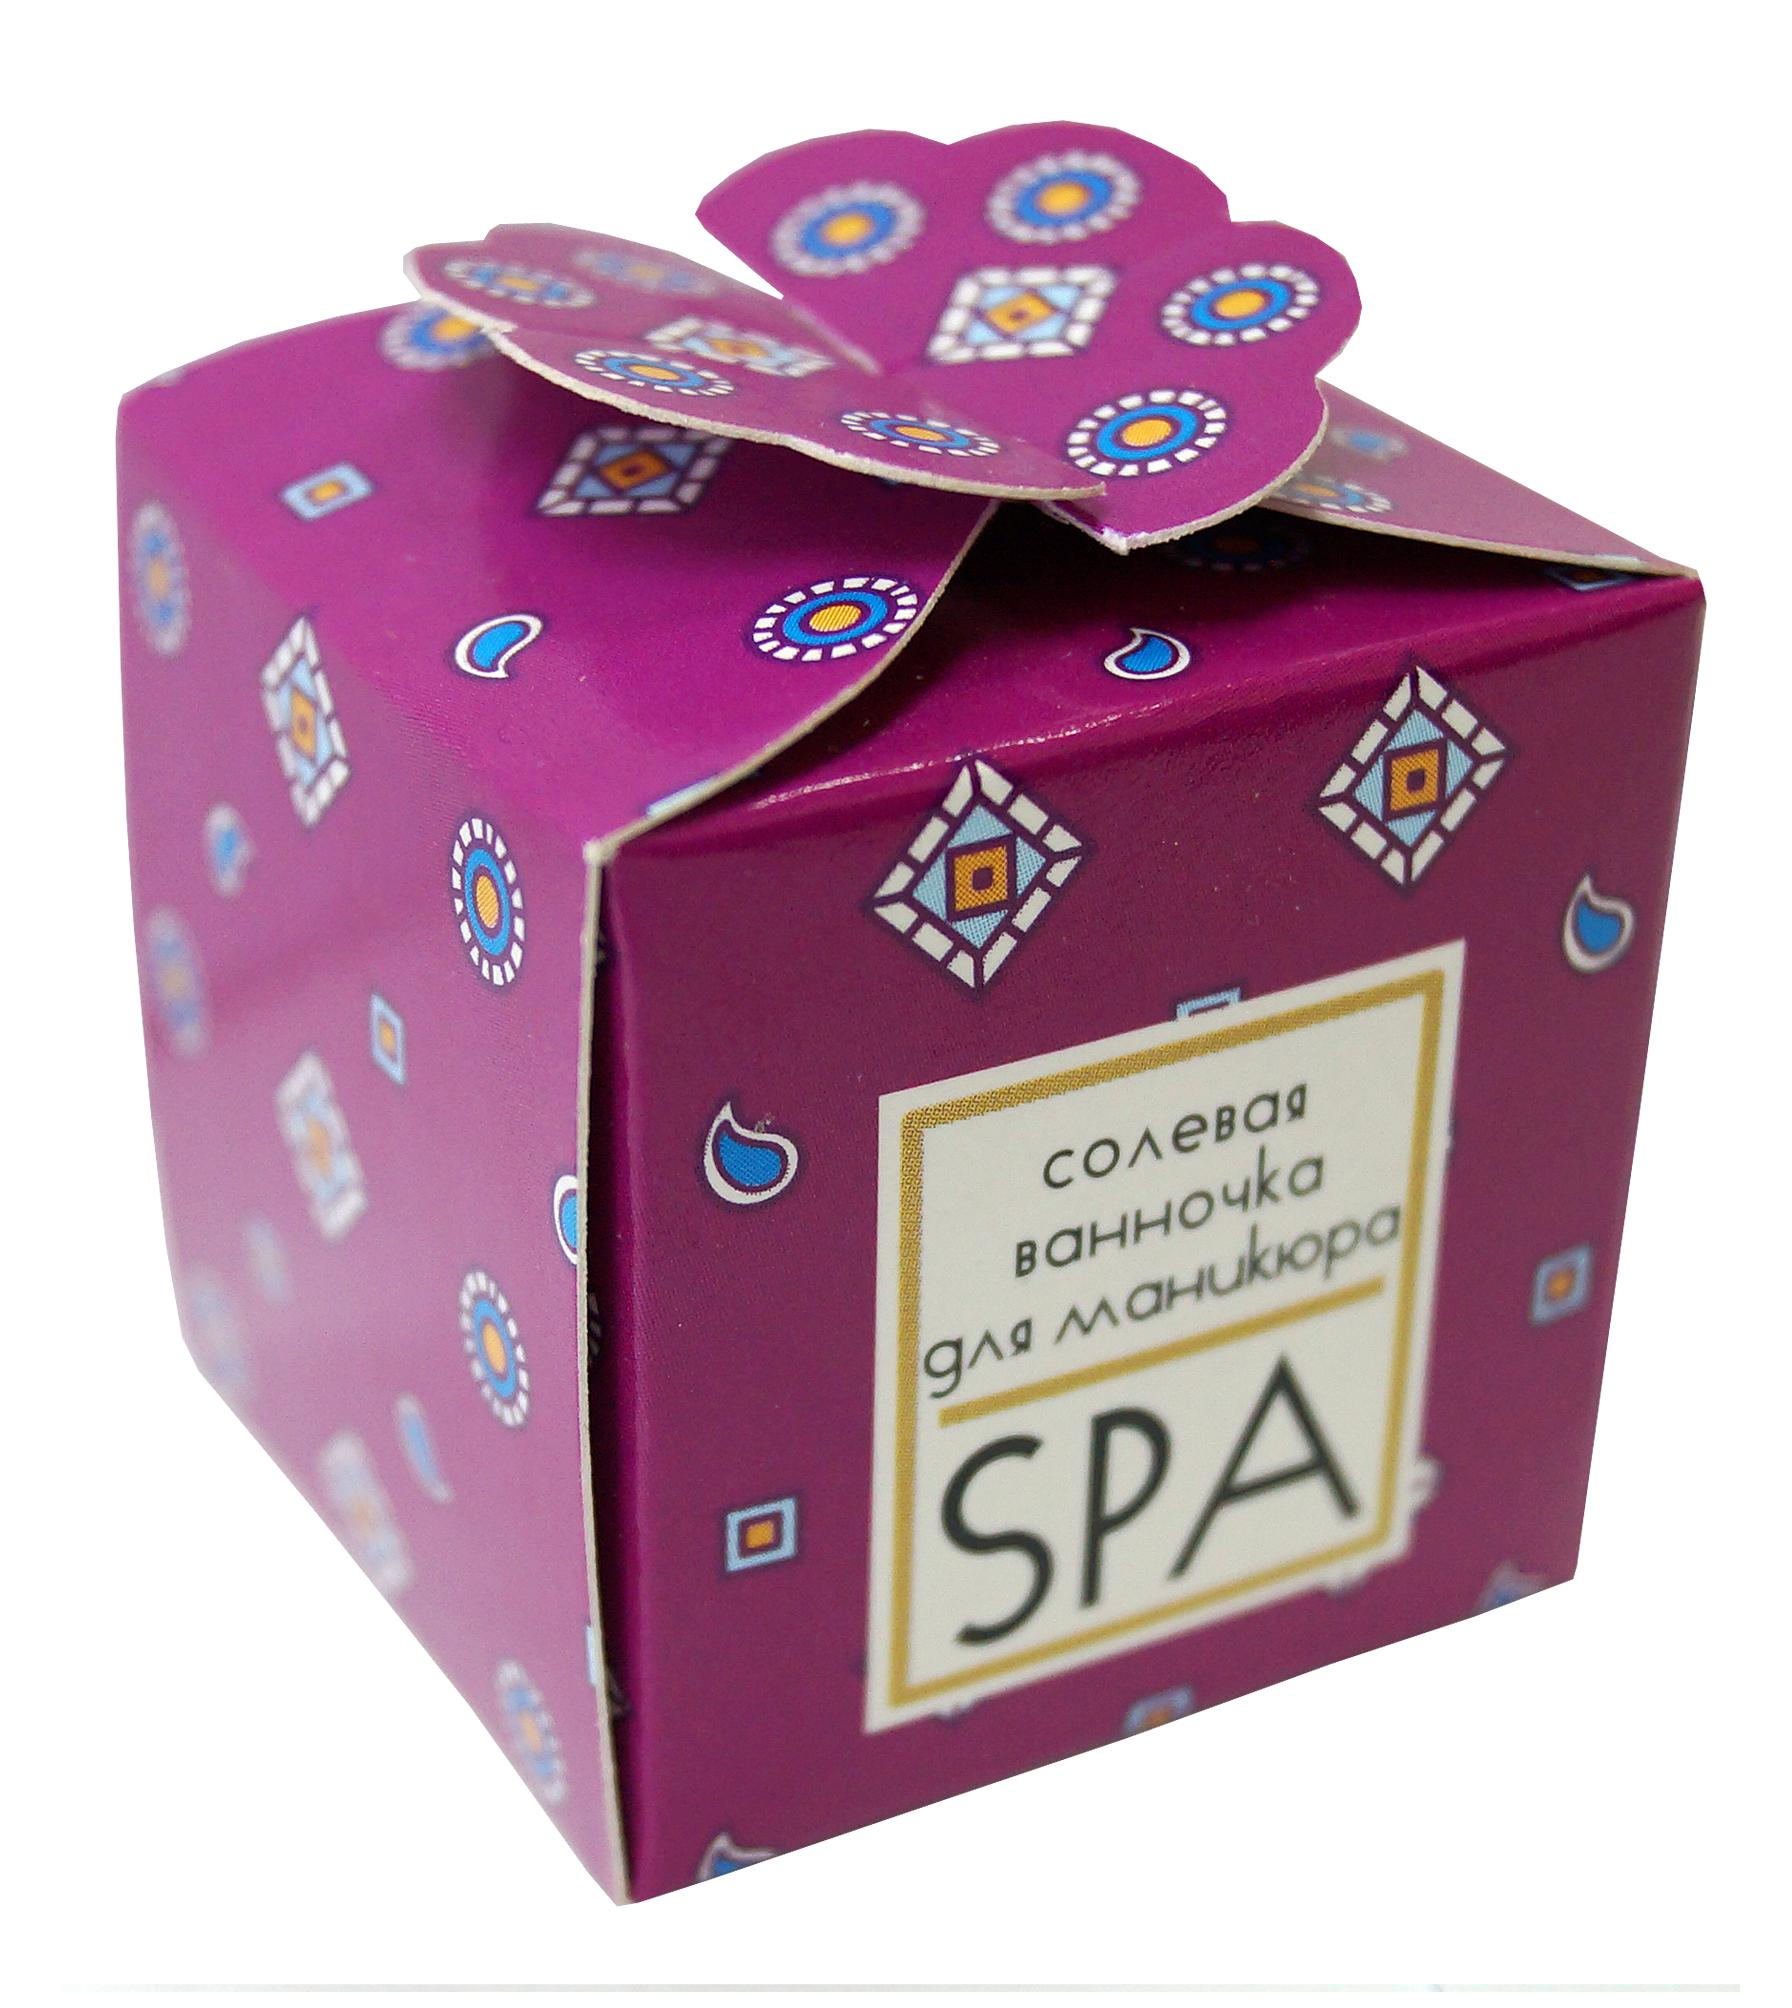 Солевая ванночка Spa by Lara для ногтей 40г Spa by Lara